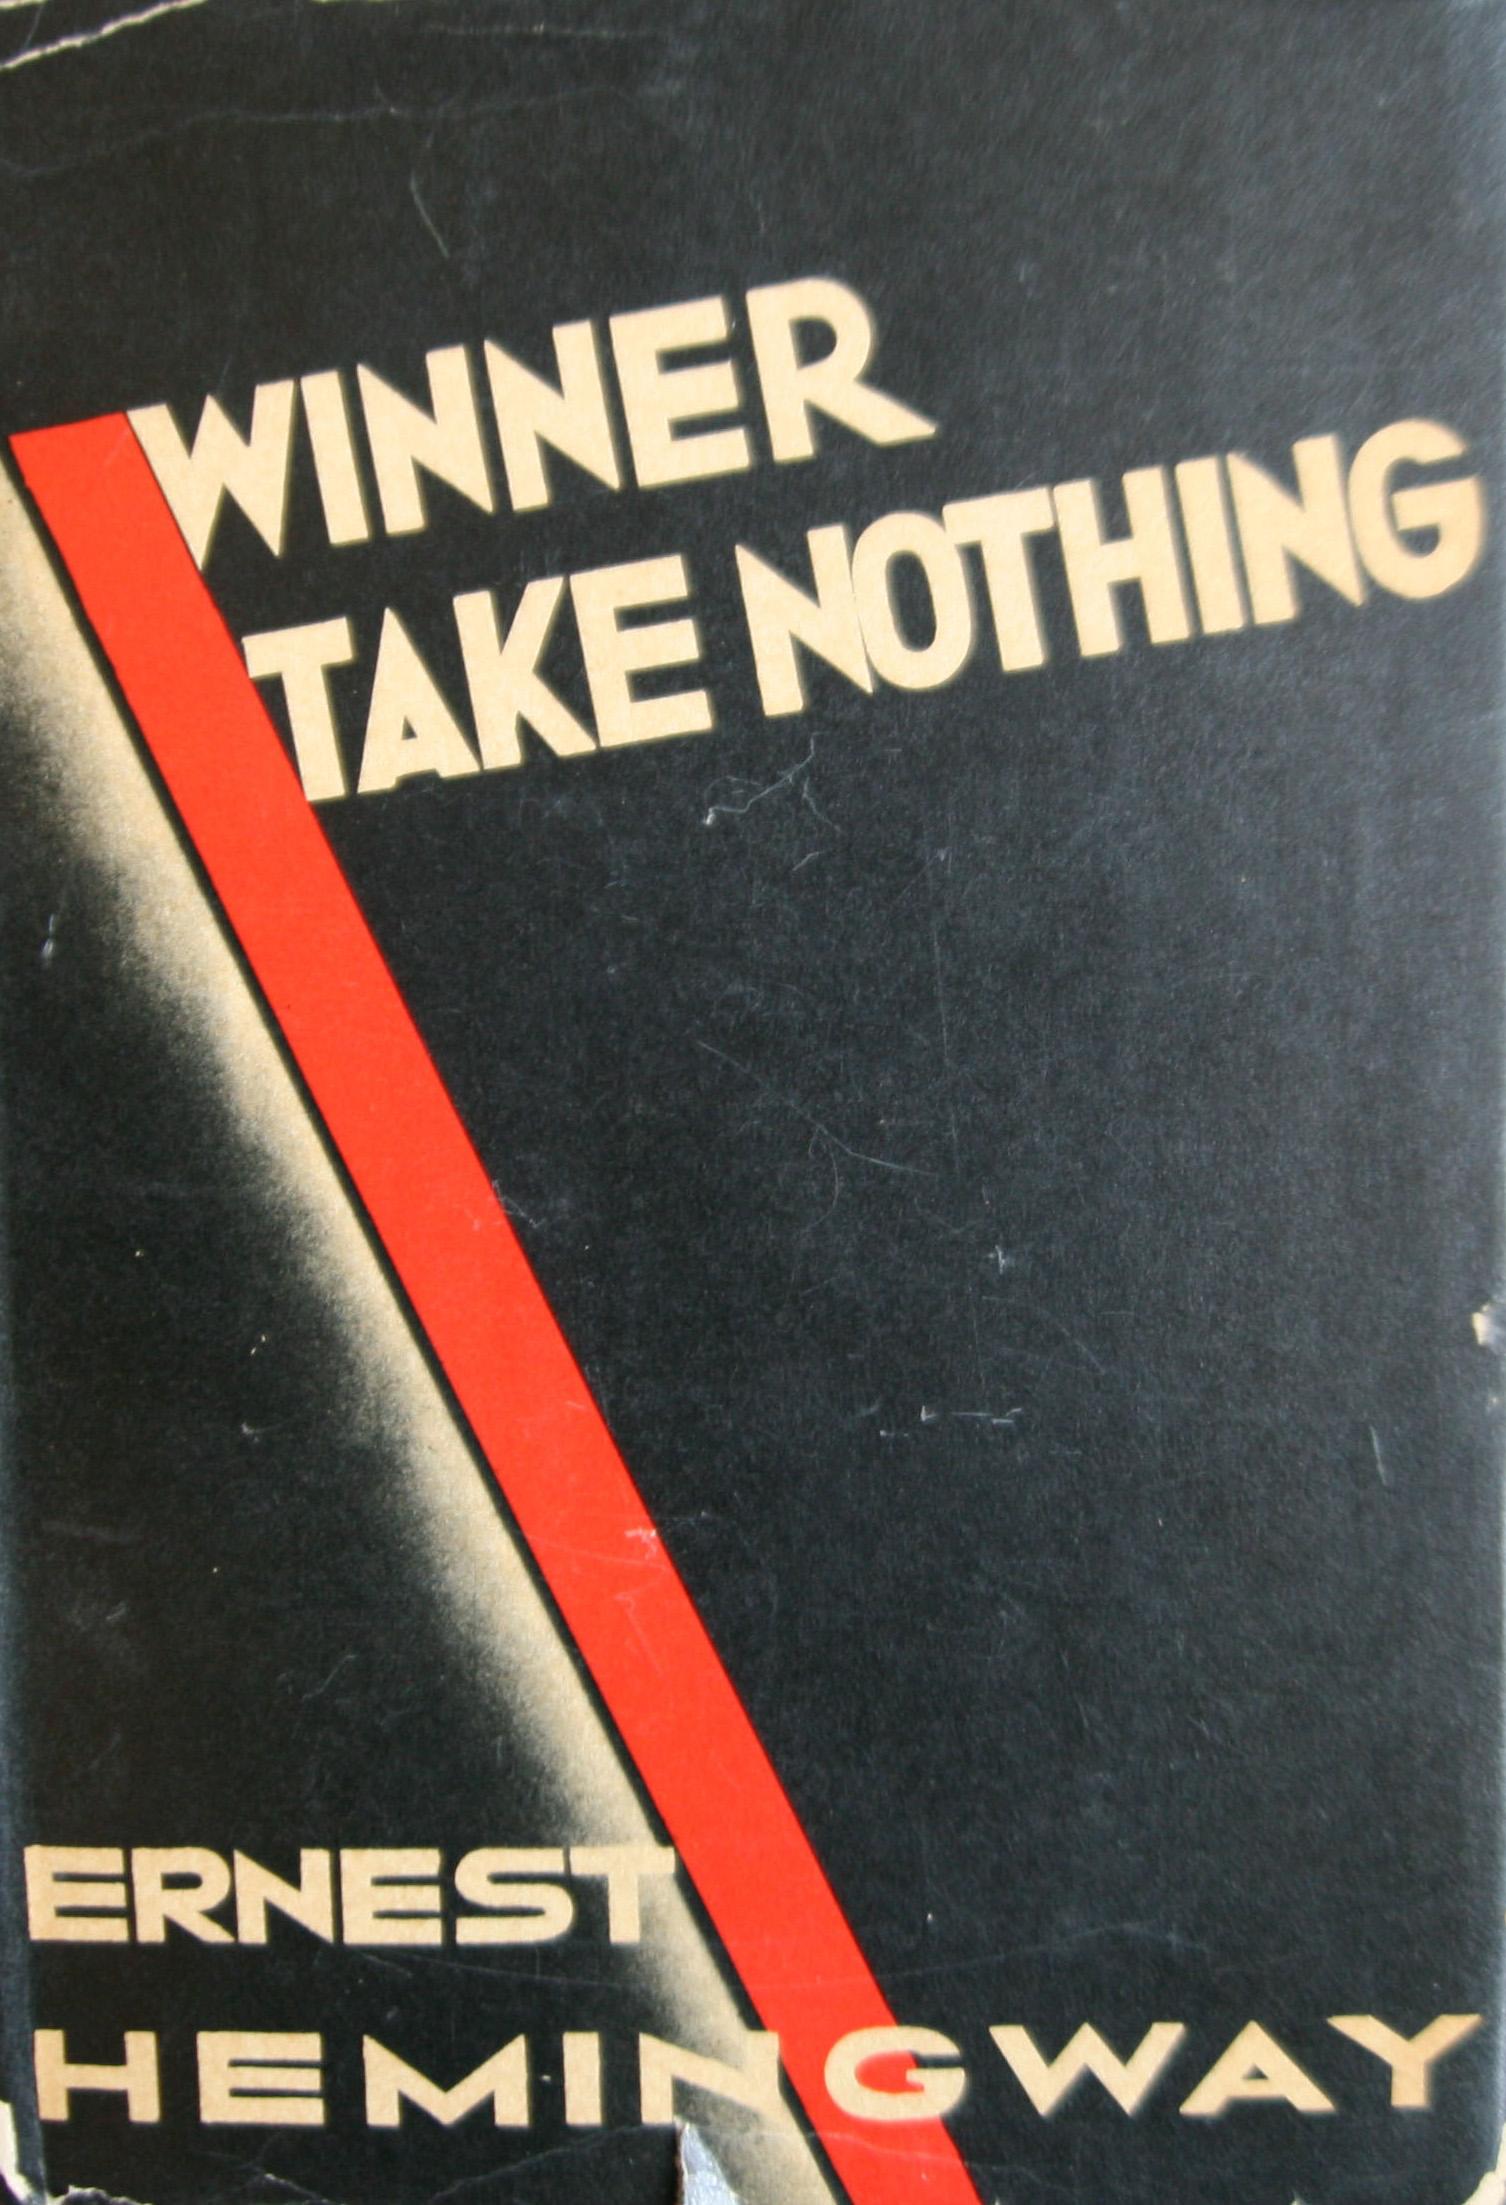 Ernest Hemingway Winner Take Nothing first edition